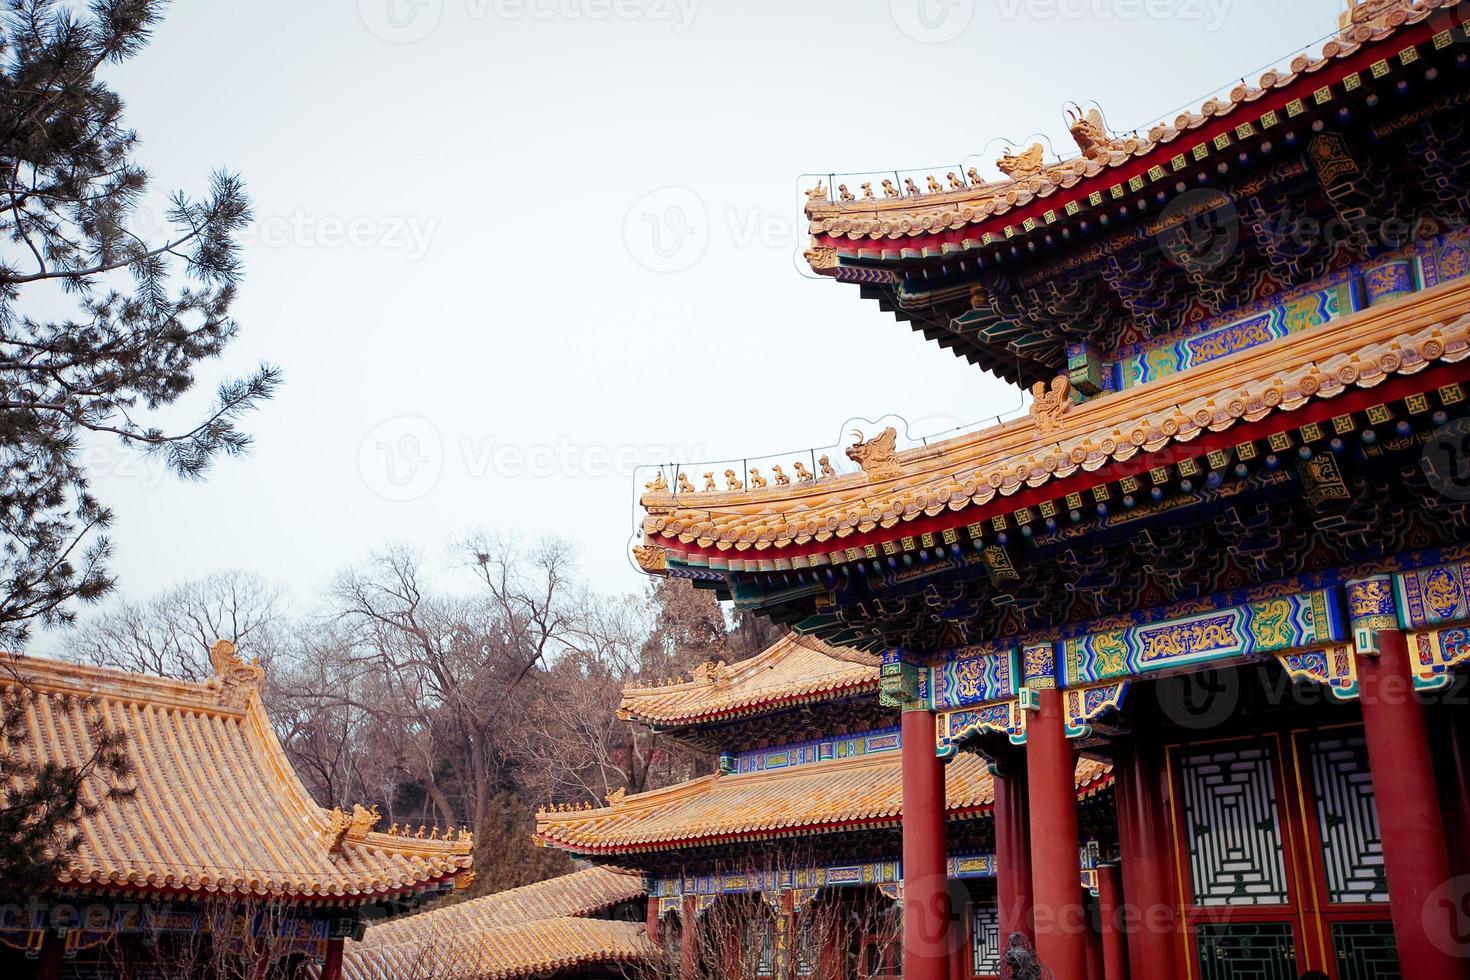 palacio de verano, beijing, china foto